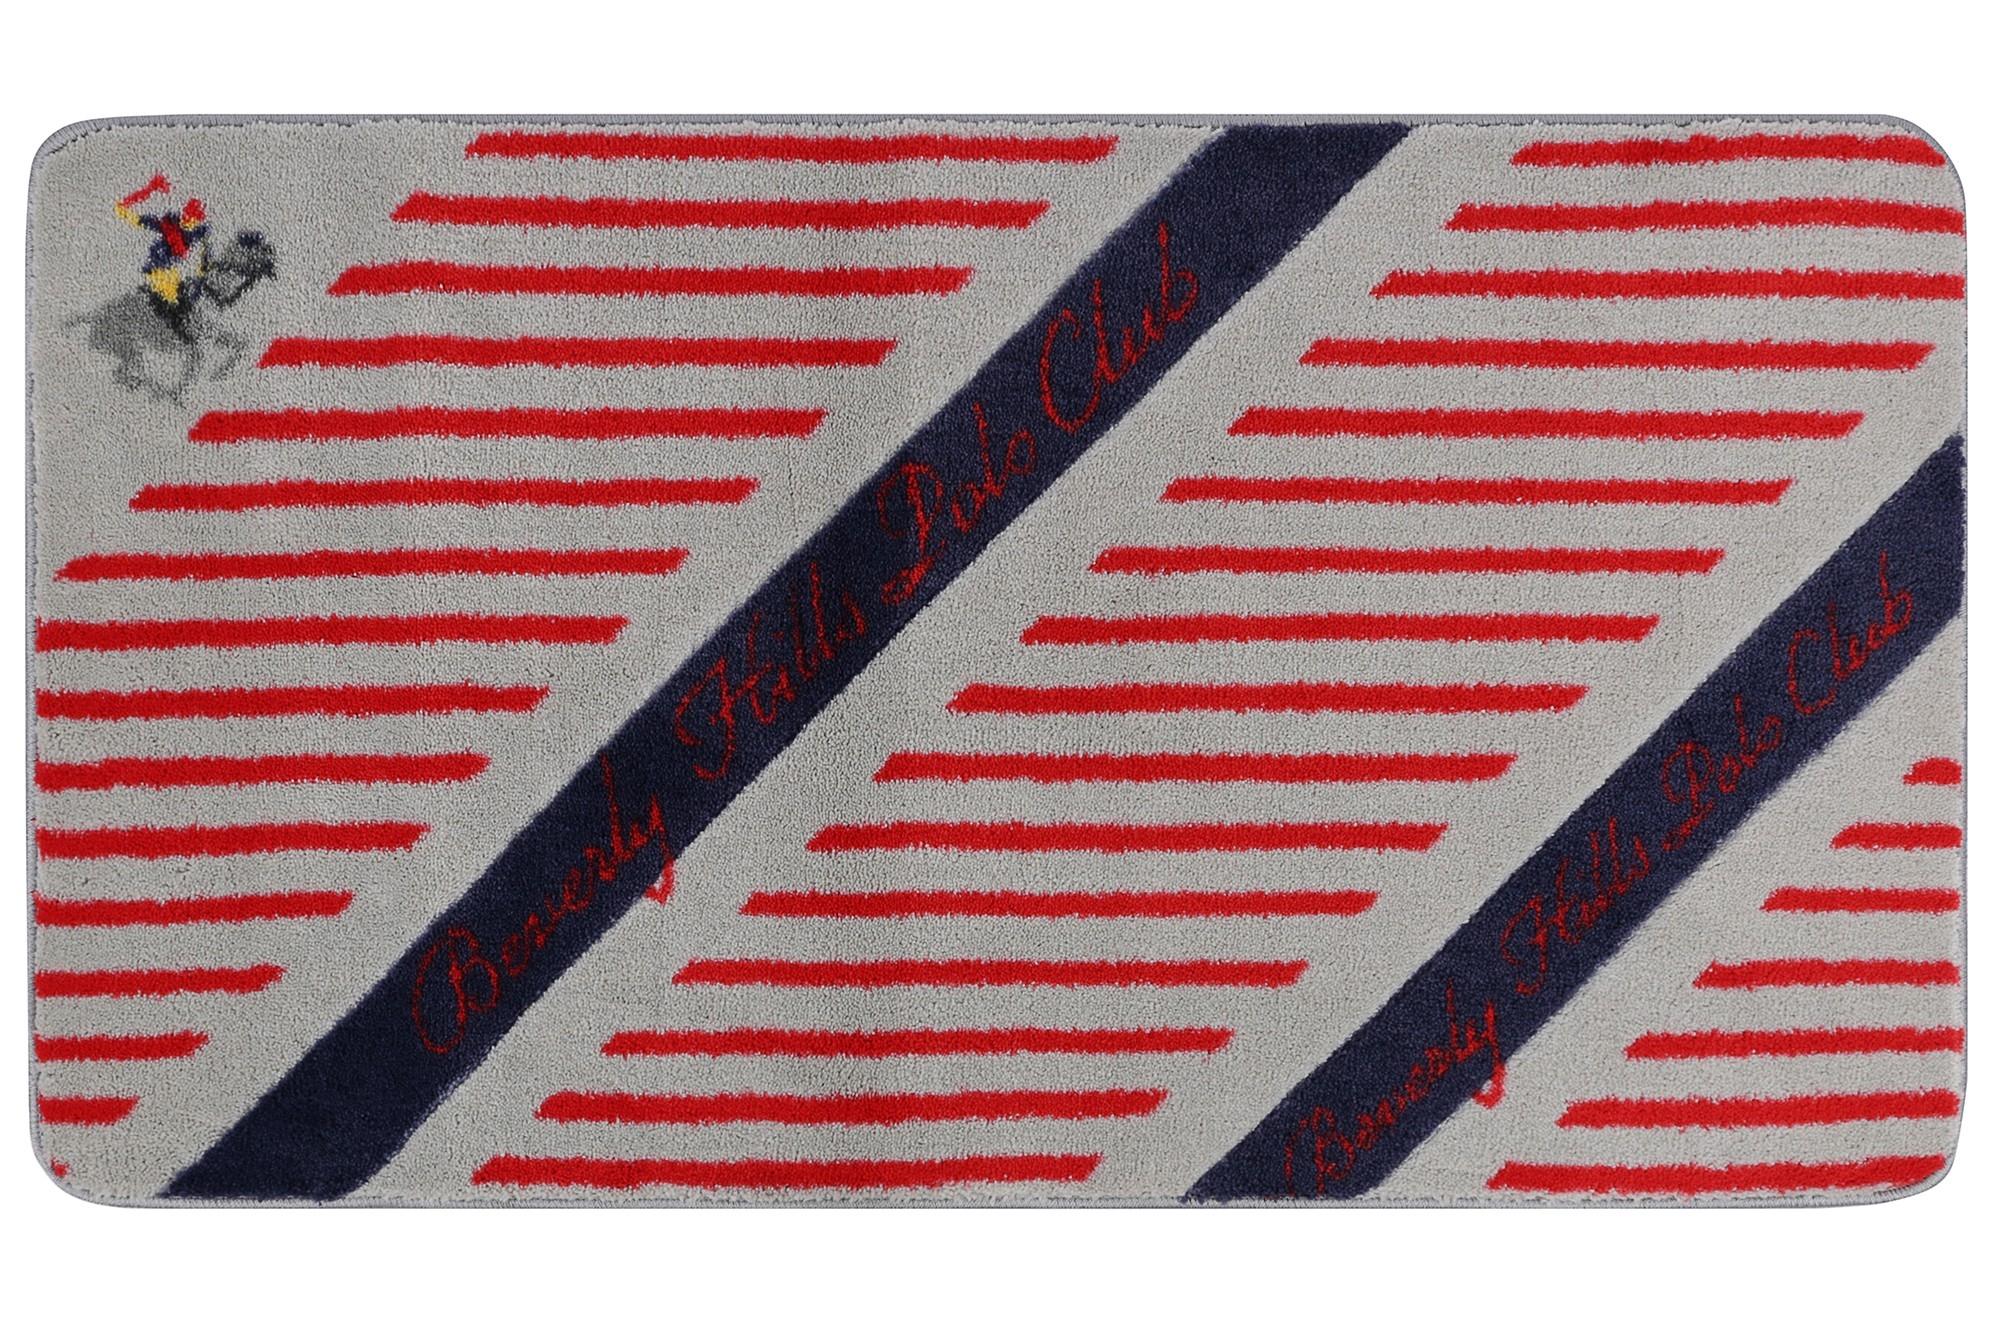 Covoras pentru baie Beverly Hills Polo Club 312 Rosu / Gri / Bleumarin, 67 x 120 cm imagine